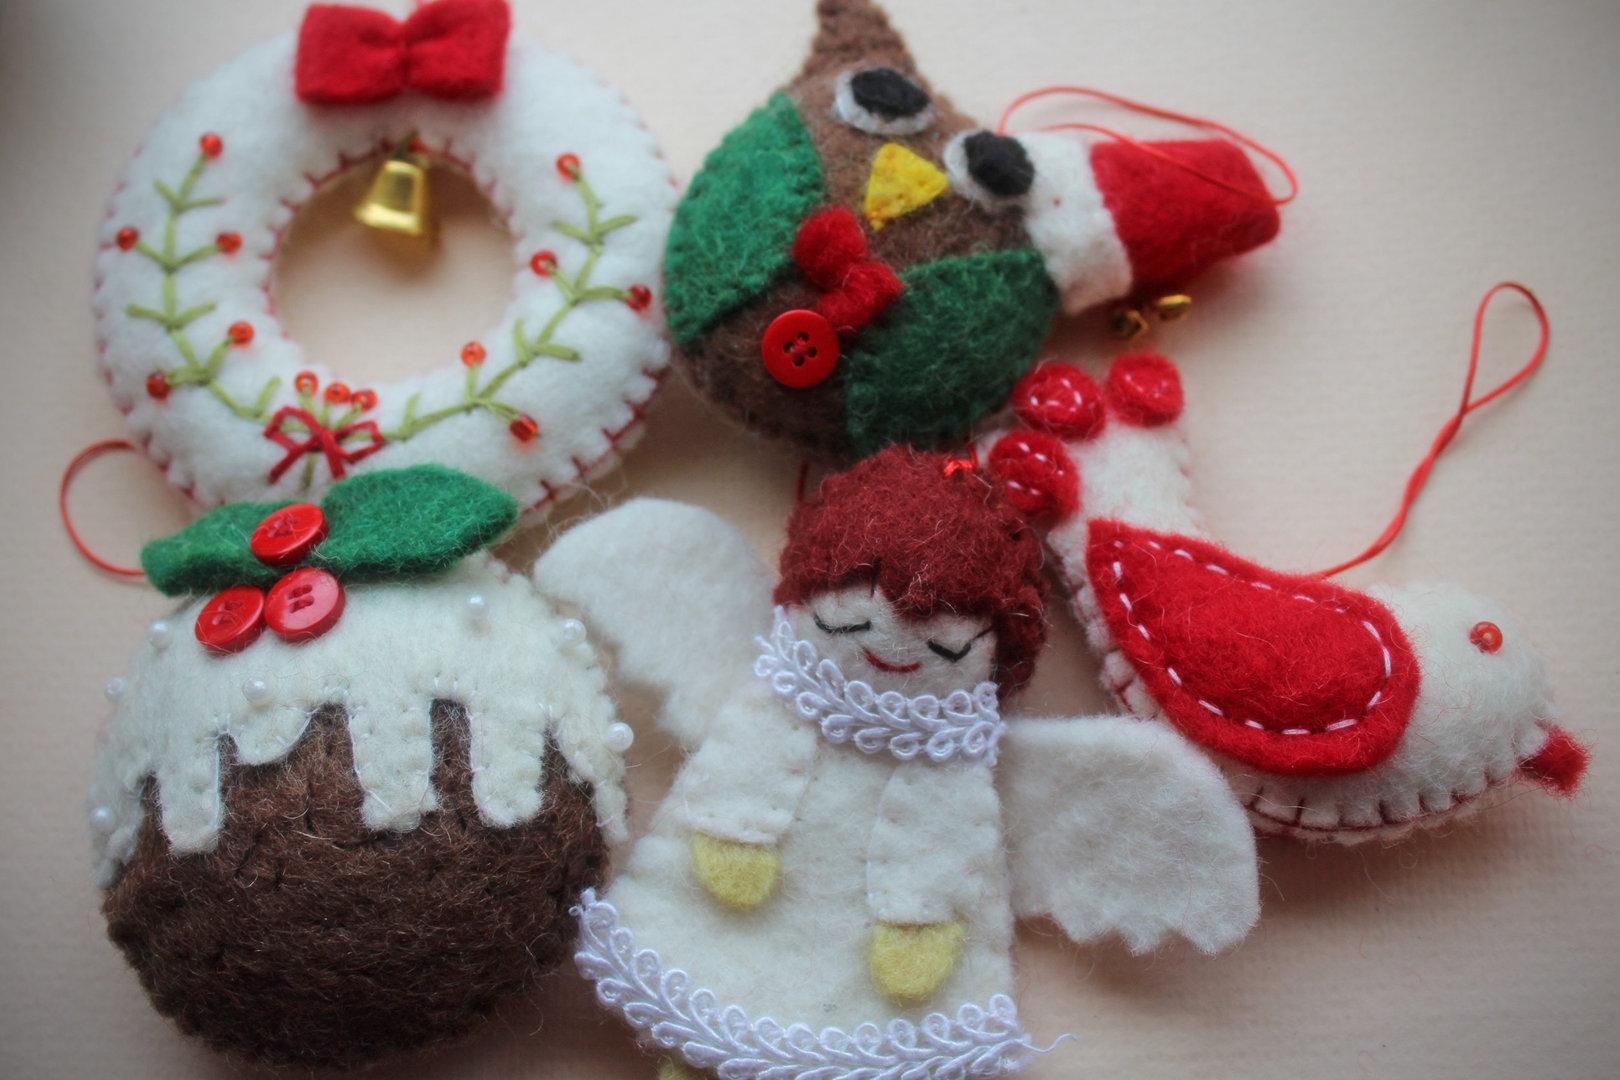 Felt Christmas Decorations Uk.Felt Christmas Decorations